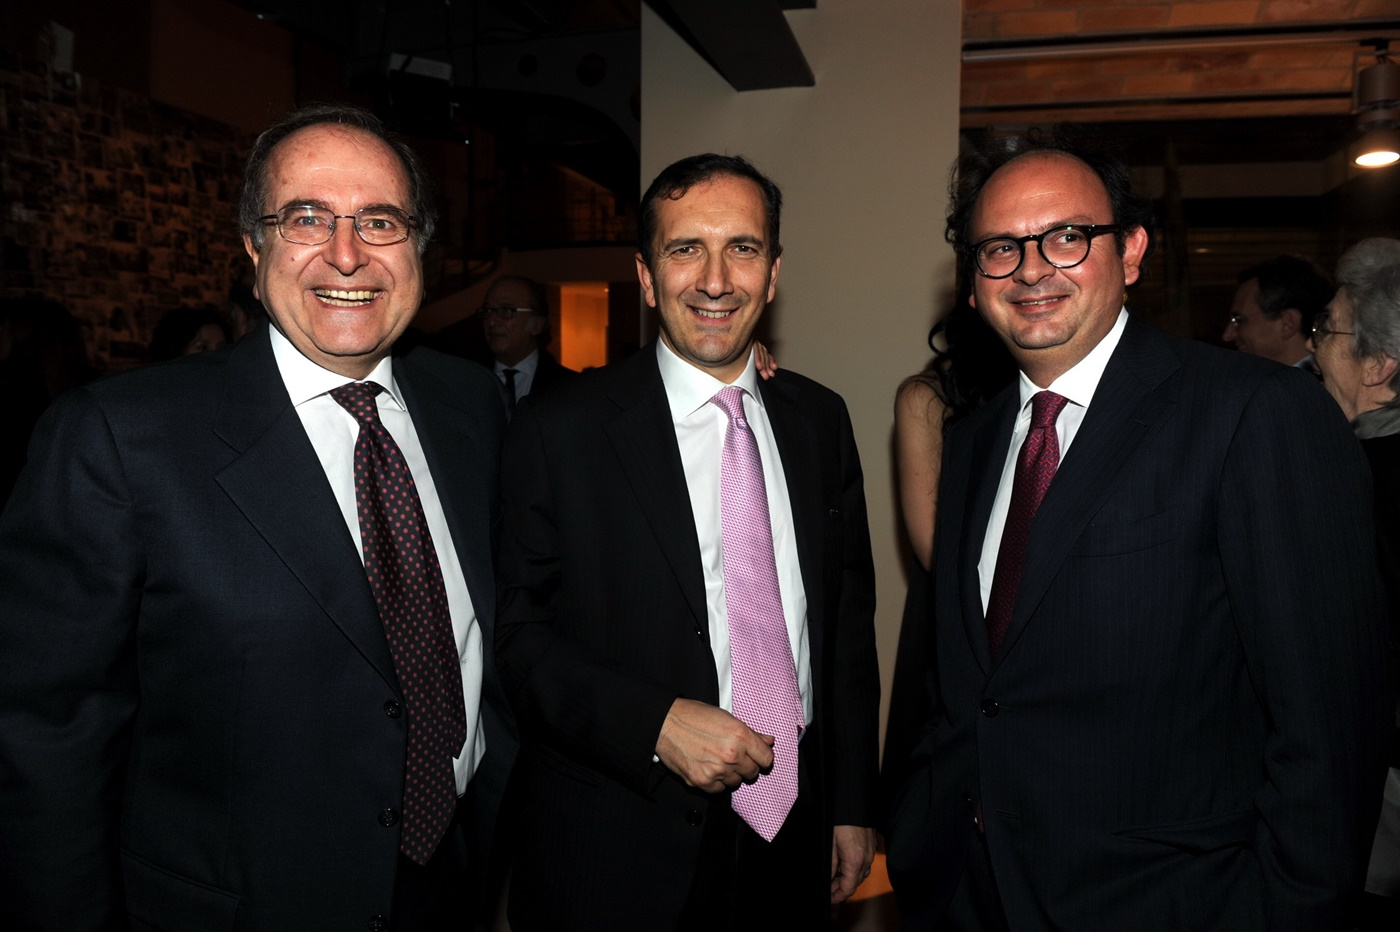 Massimo Caputi, Luigi Gubitosi e Gianluca Comin